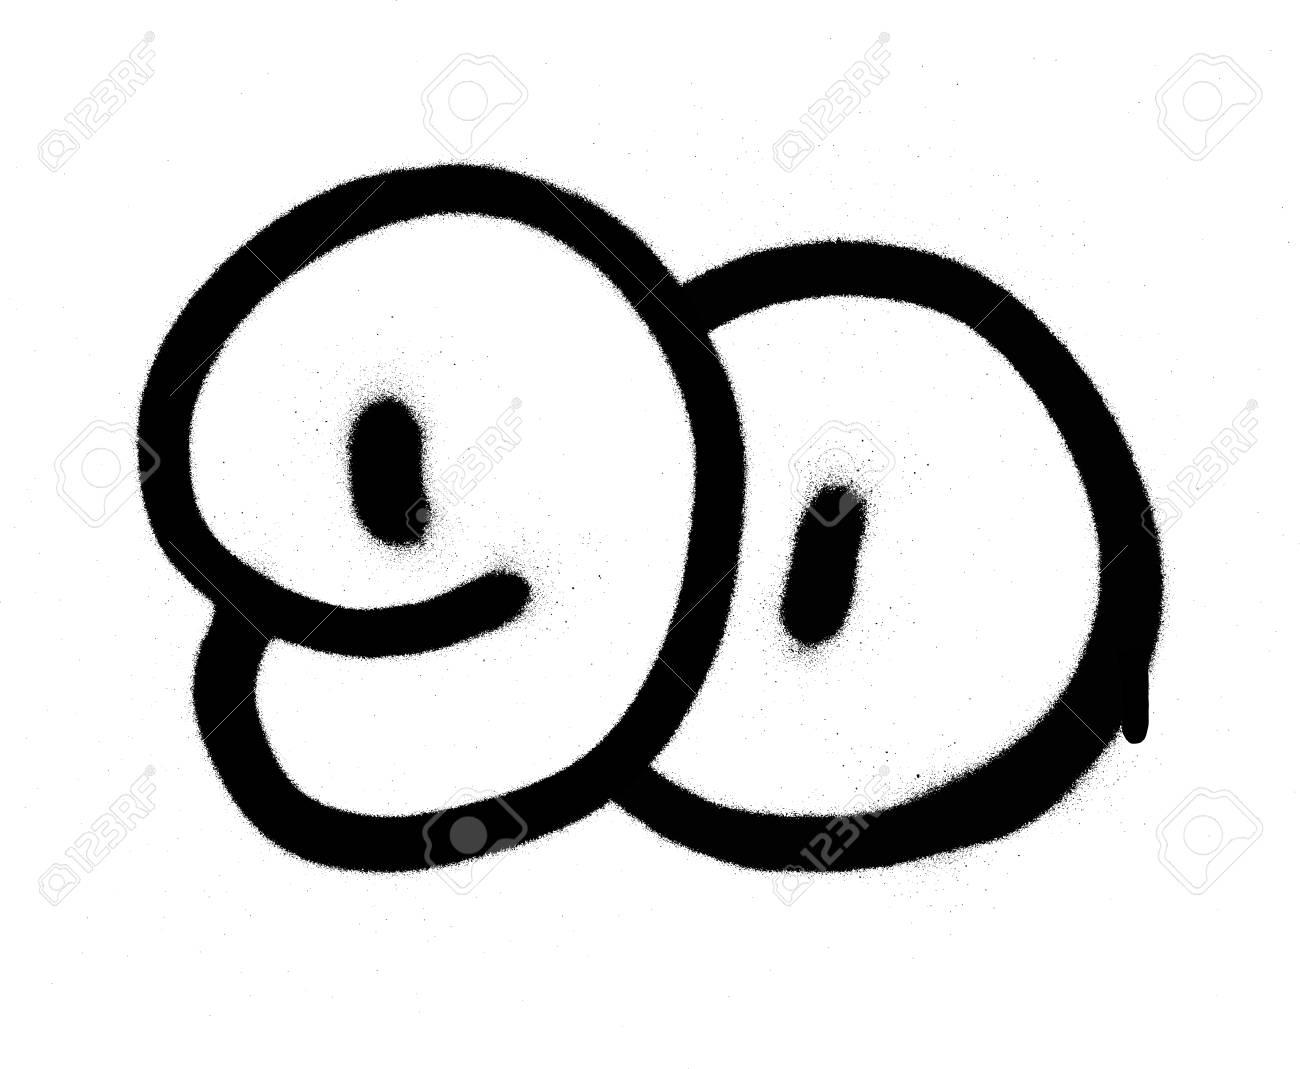 graffiti number 90 ninety sprayed in black over white.